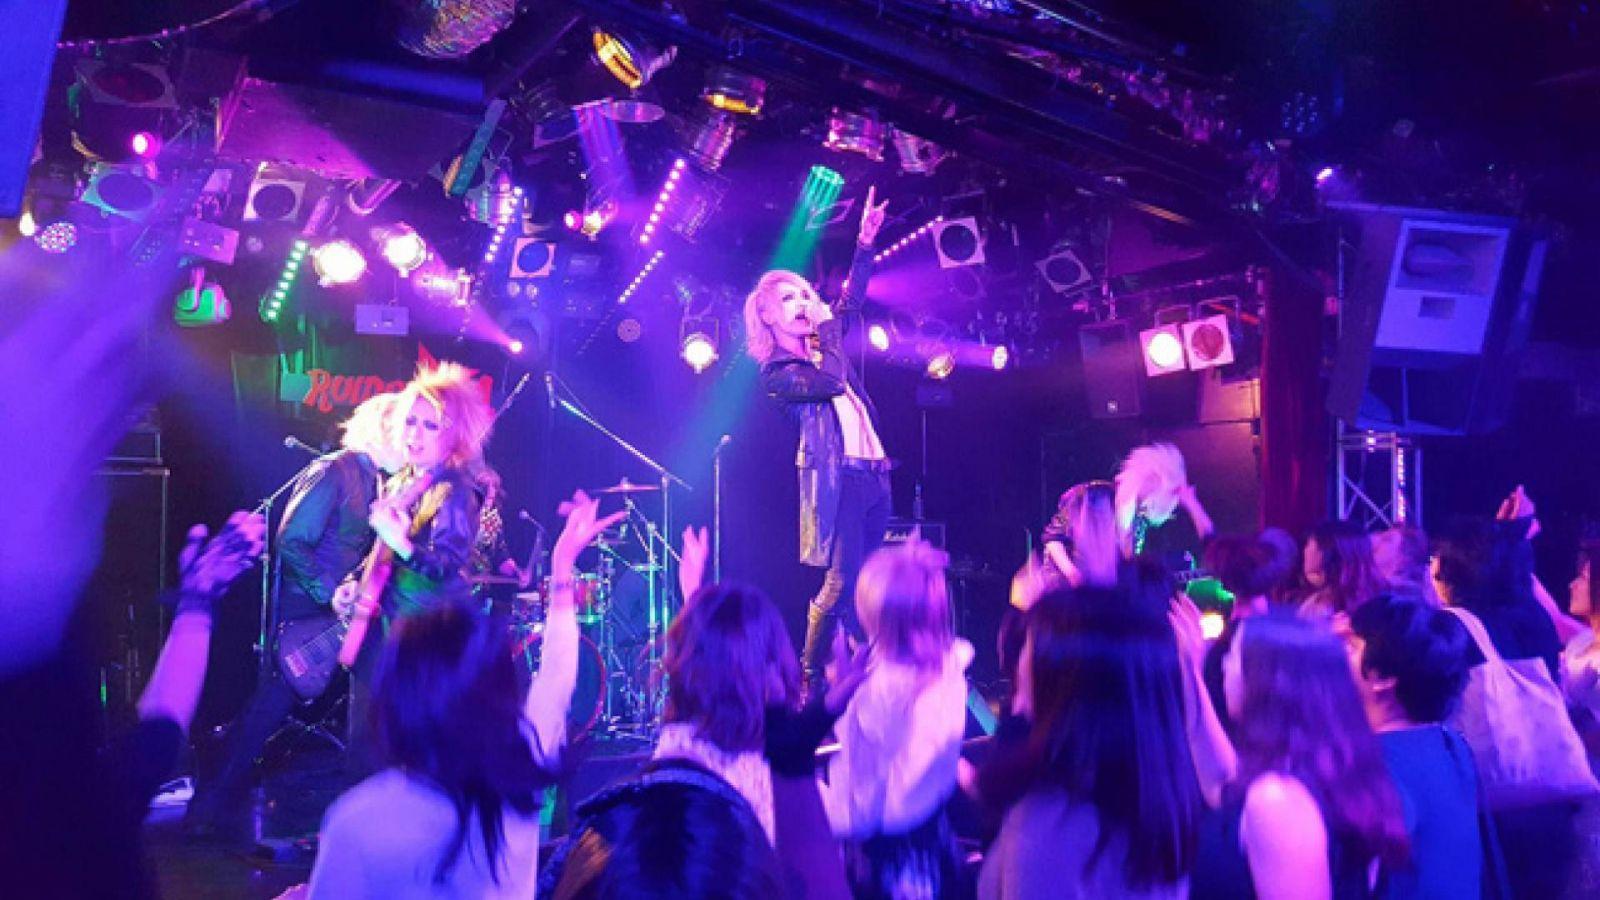 Wygraj bilet na koncert G.L.A.M.S! © Aurélie